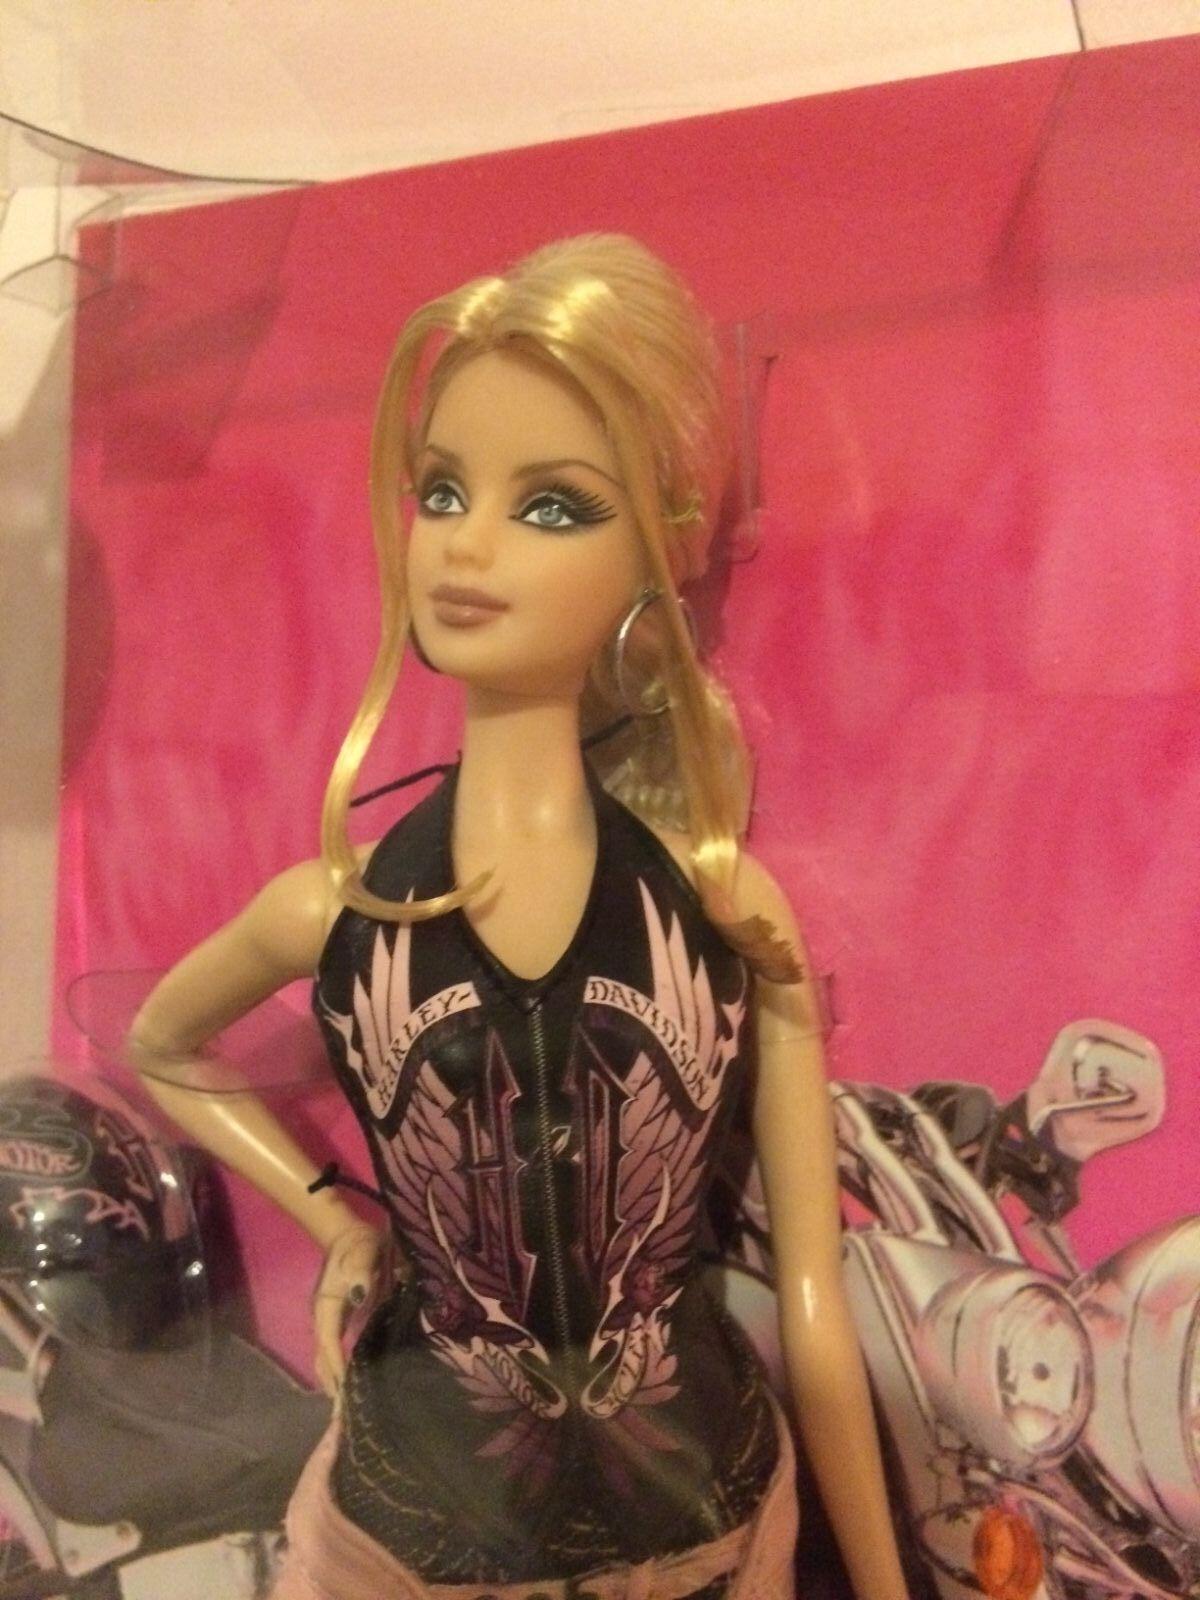 rosado LABEL, 2008 Harley Davidson Barbie mai tolto dalla scatola